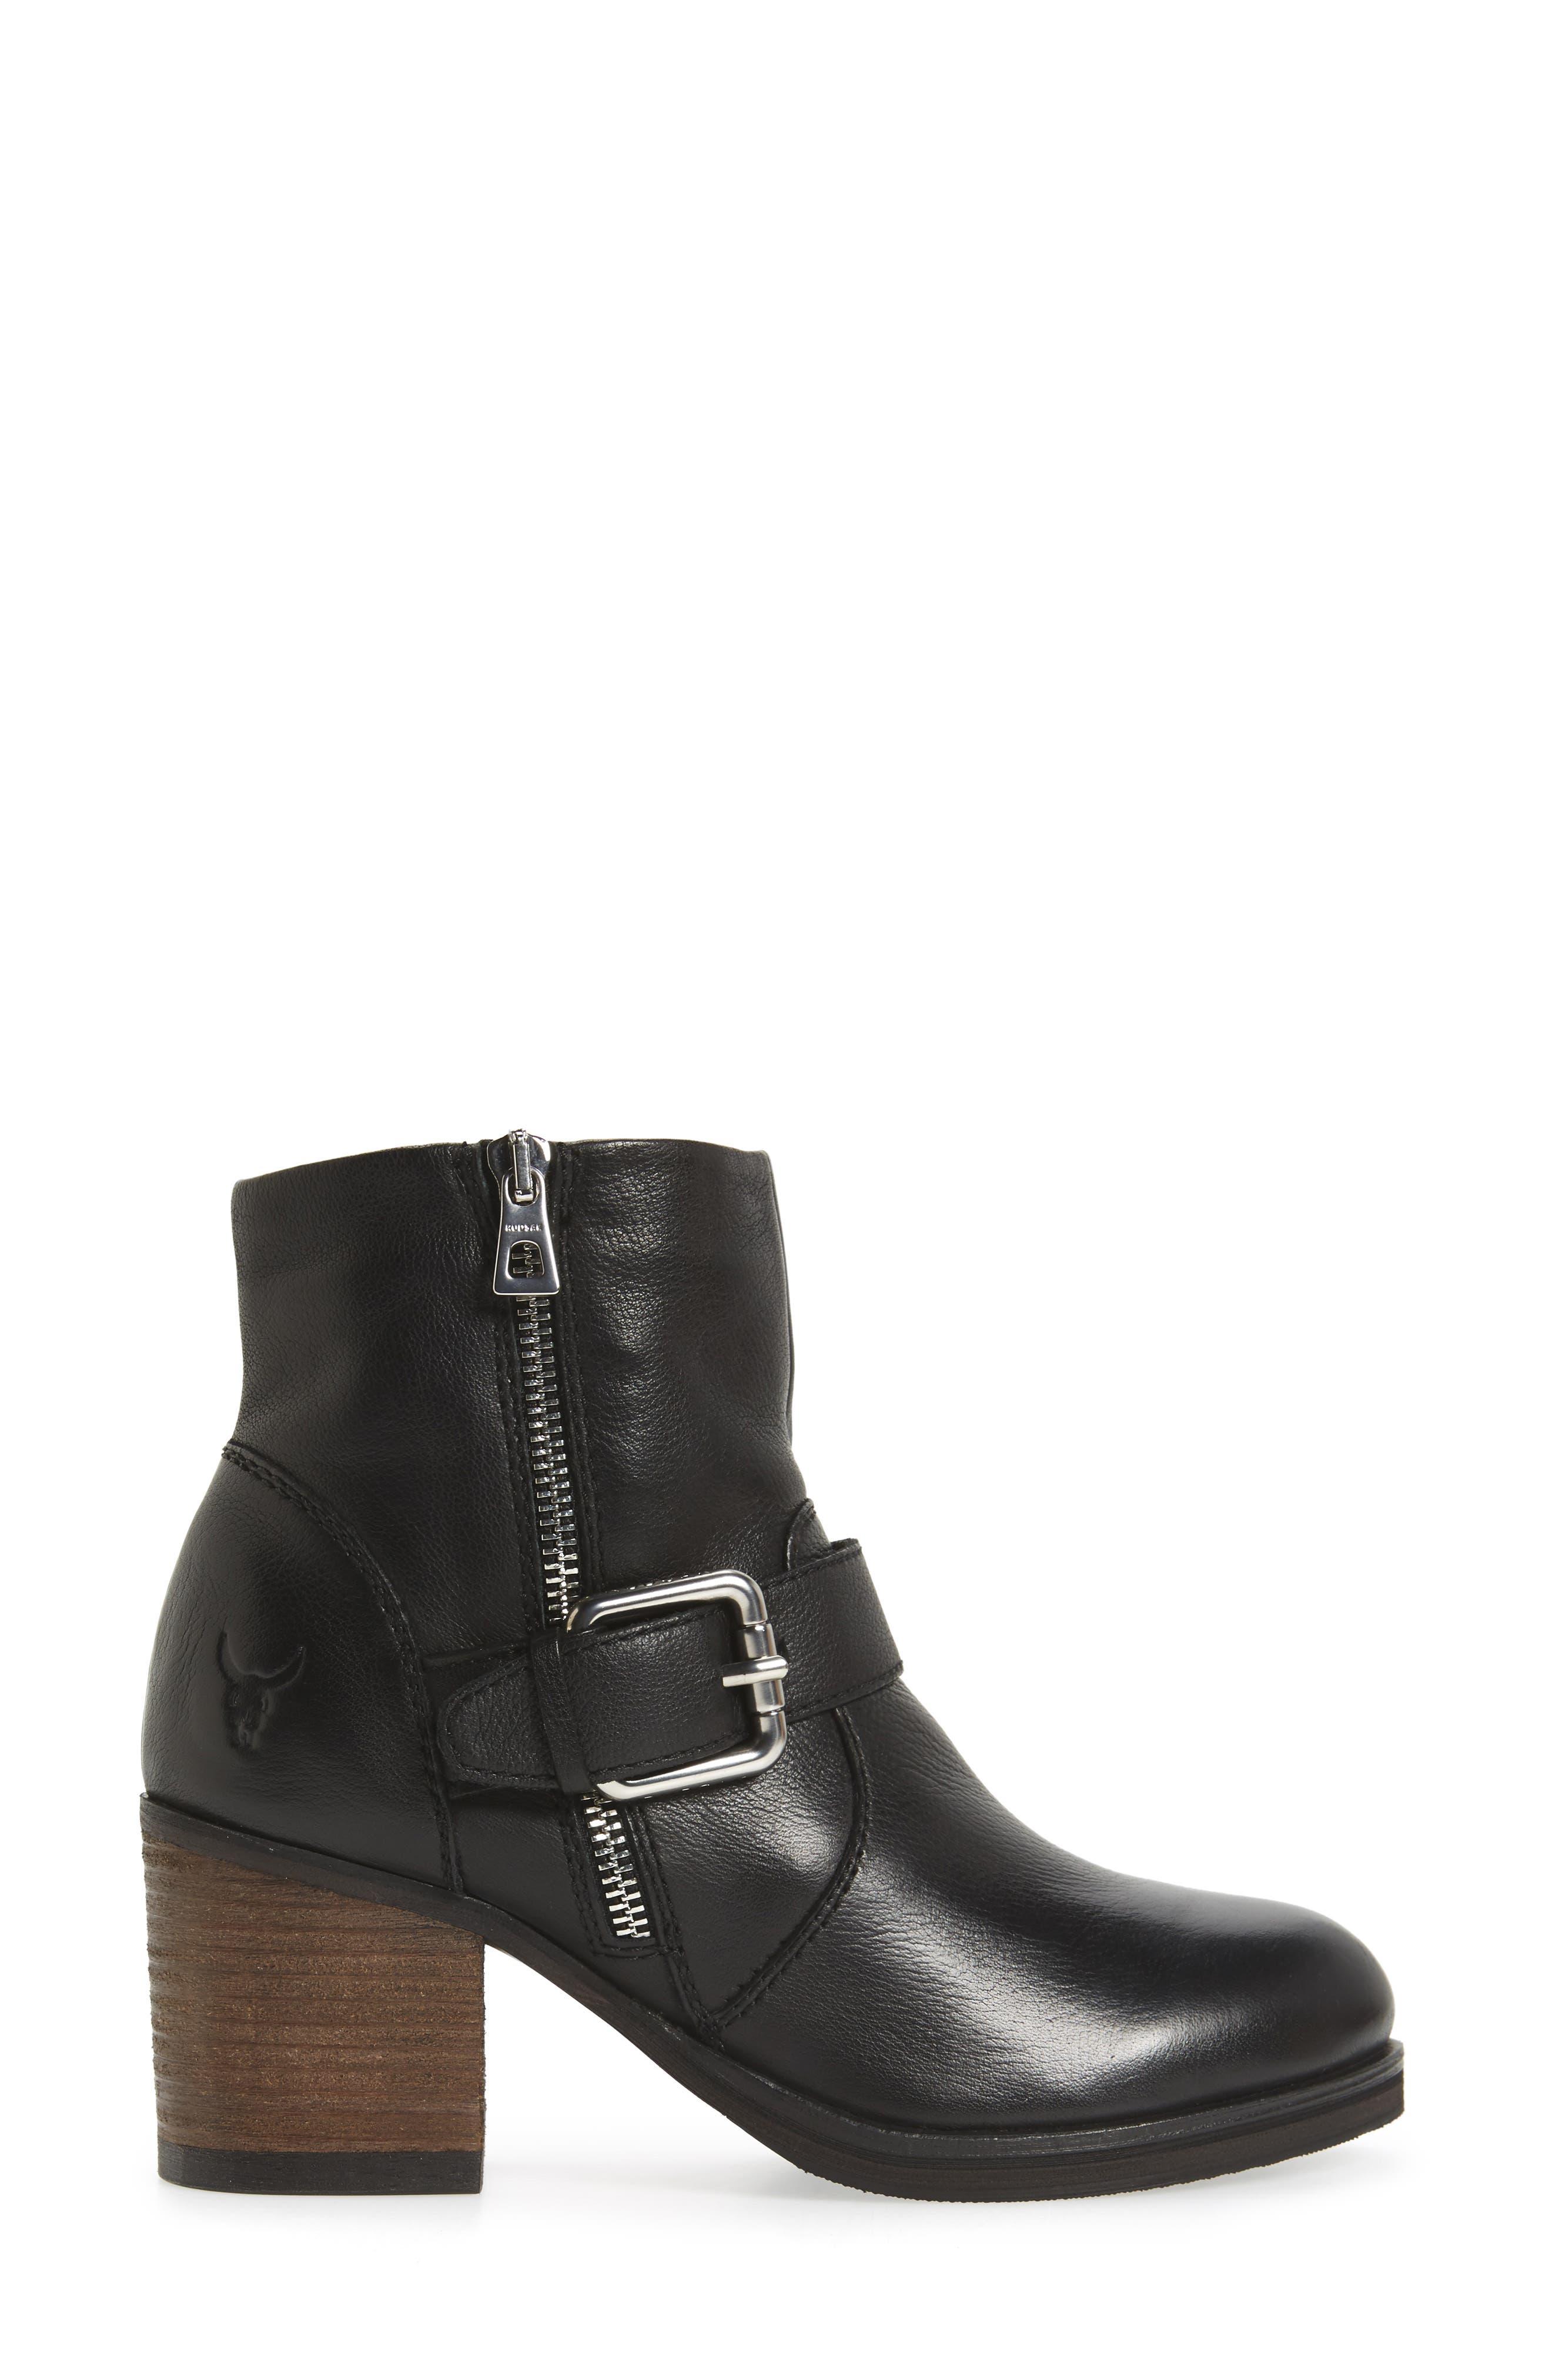 Balady Boot,                             Alternate thumbnail 3, color,                             Black/ Black Leather